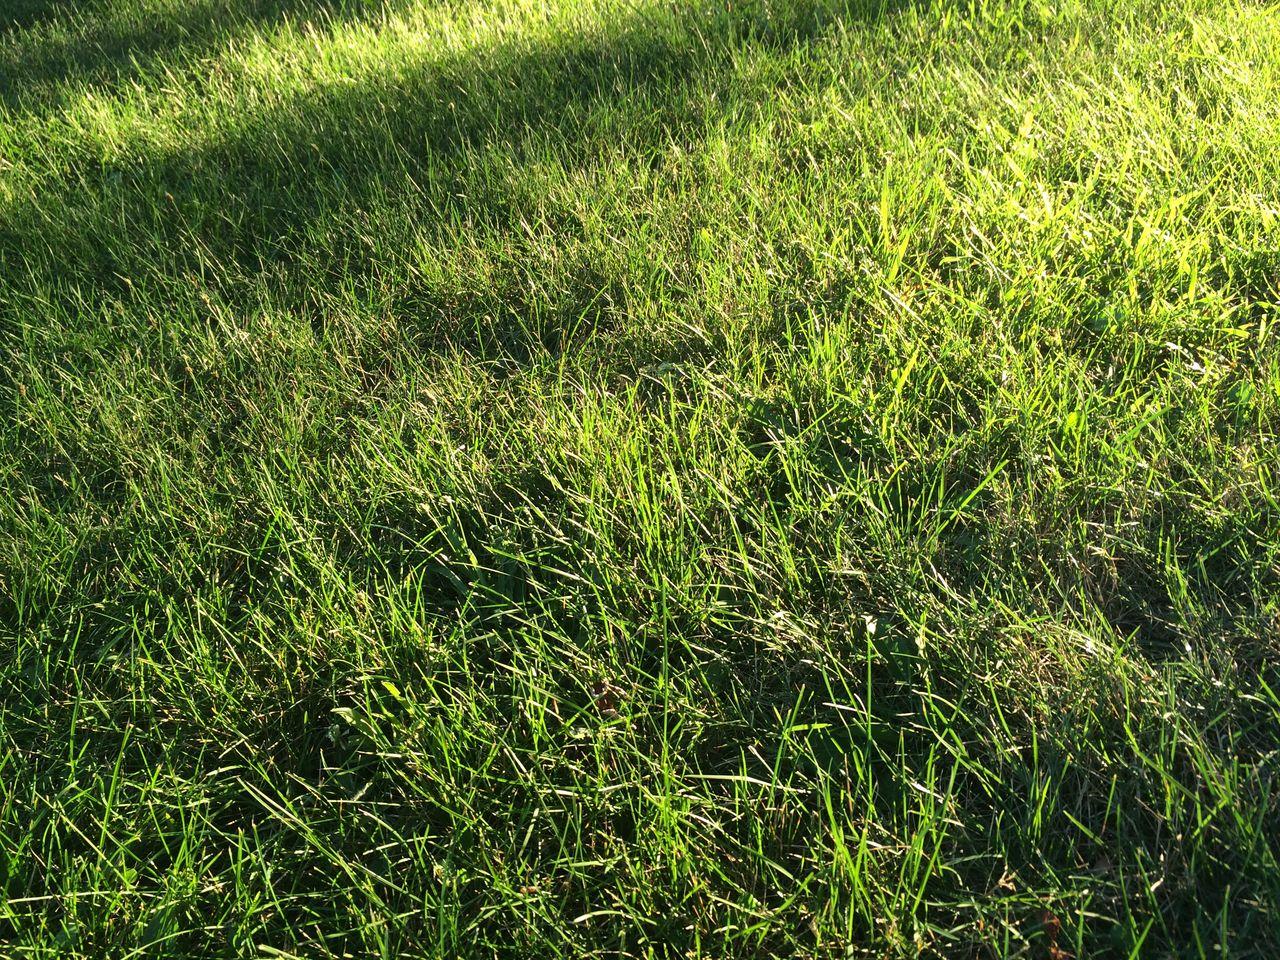 DETAIL SHOT OF GREEN GRASSY FIELD